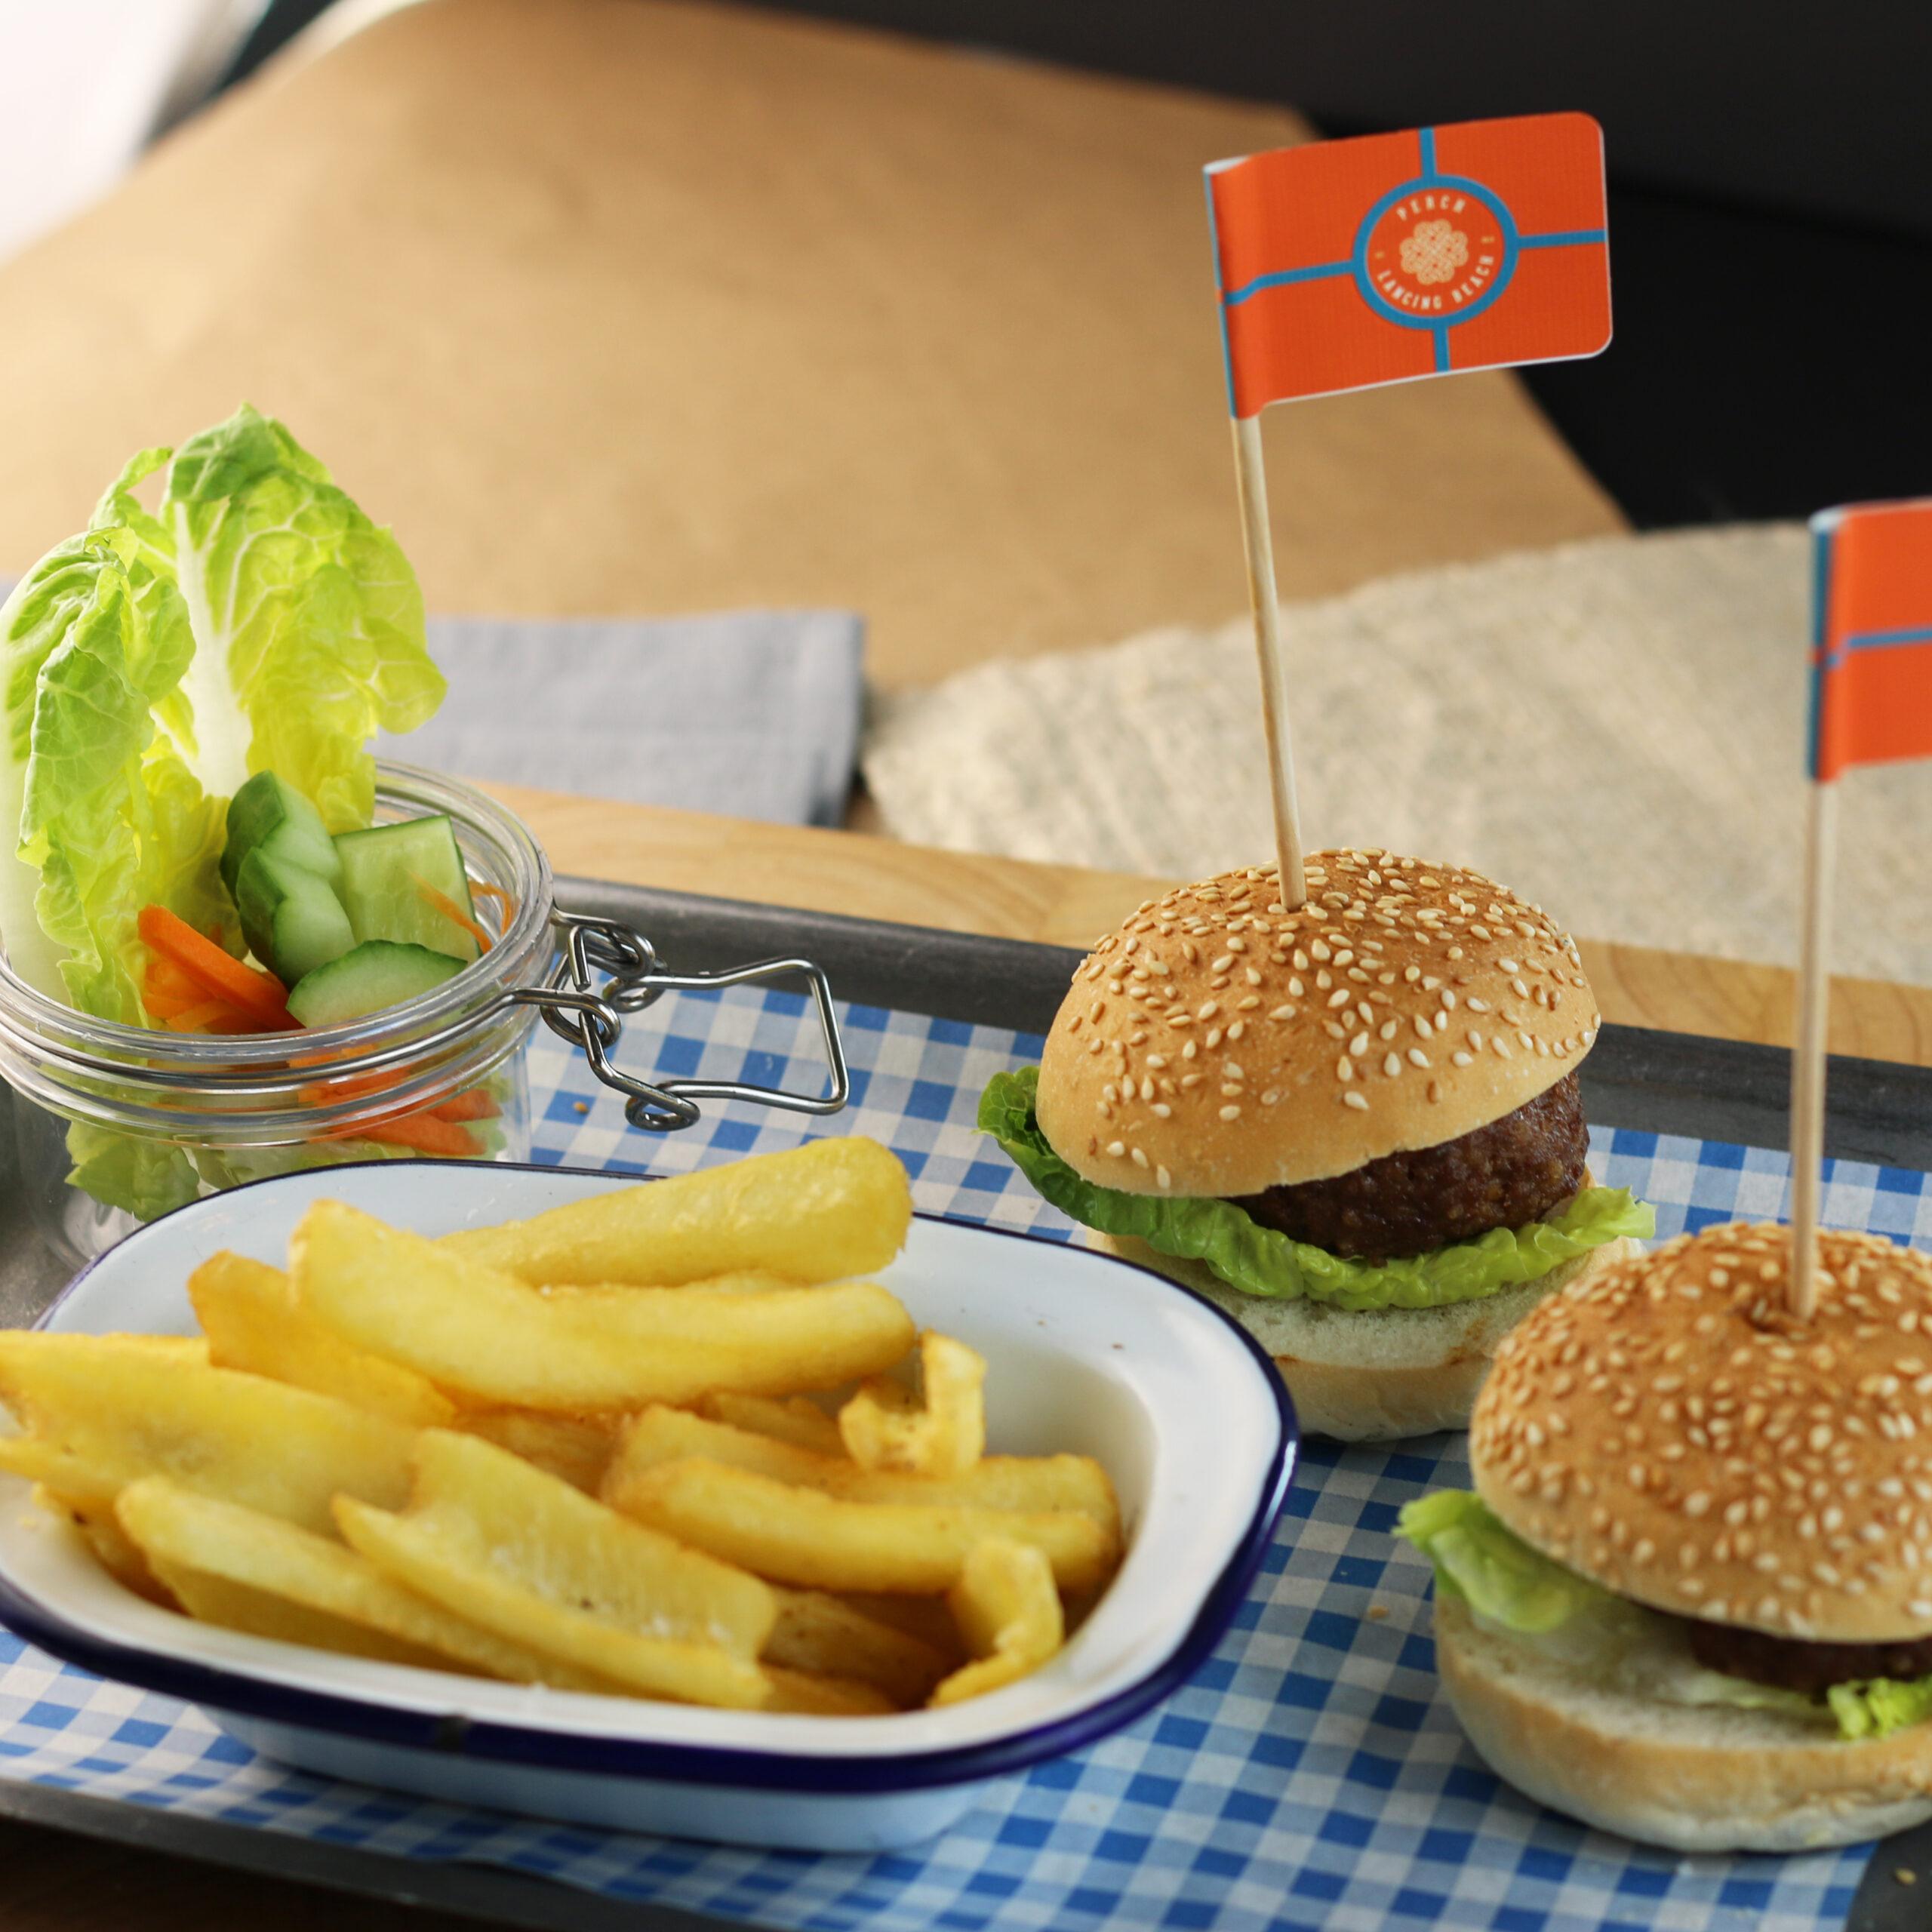 Kids mini burgers with a bowl of fries and mason jar of salad